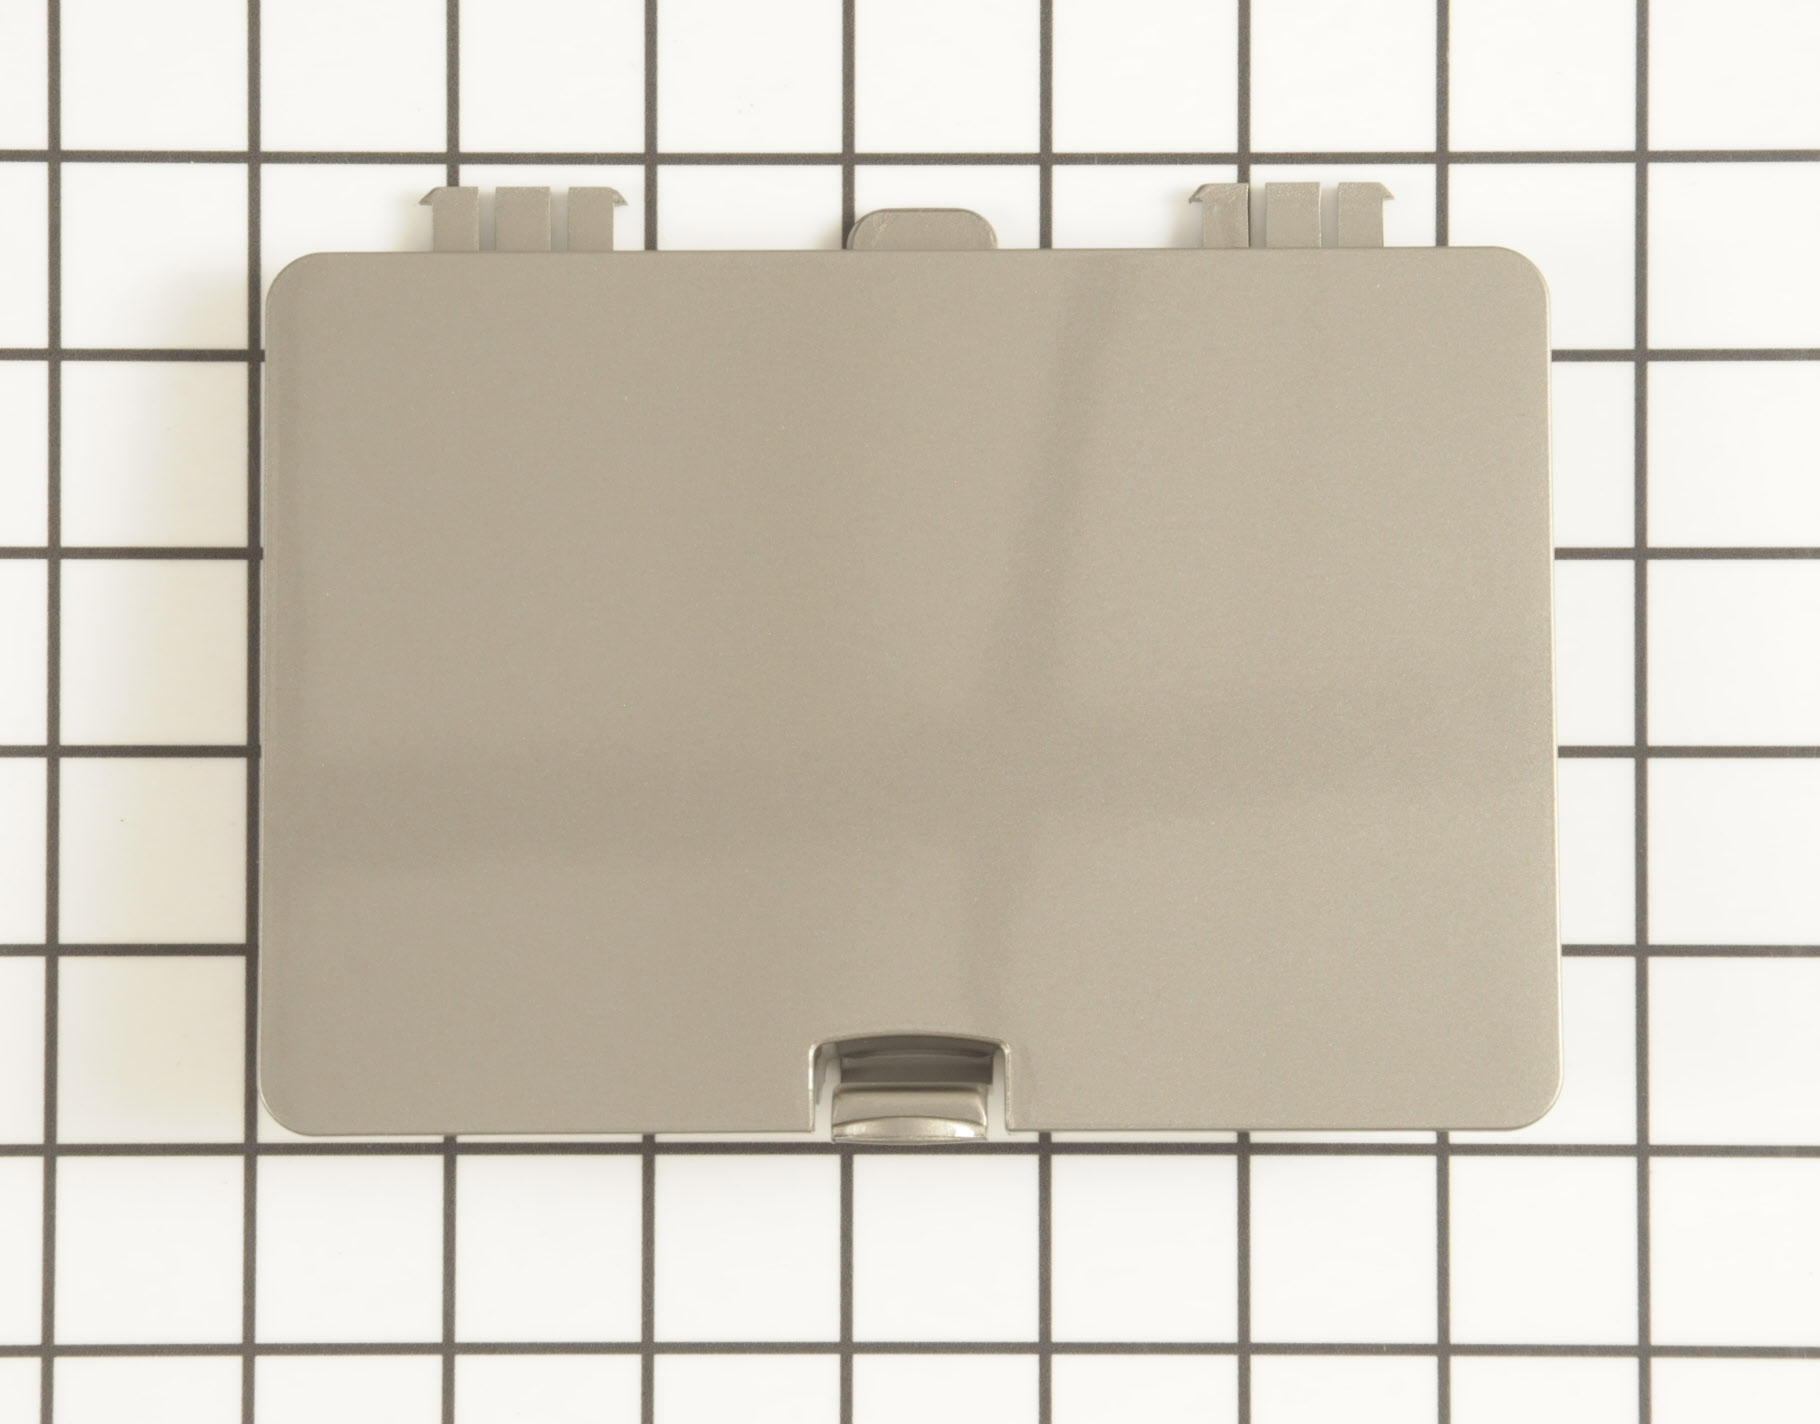 LG Washing Machine Part # 5006ER2006Z - Cover